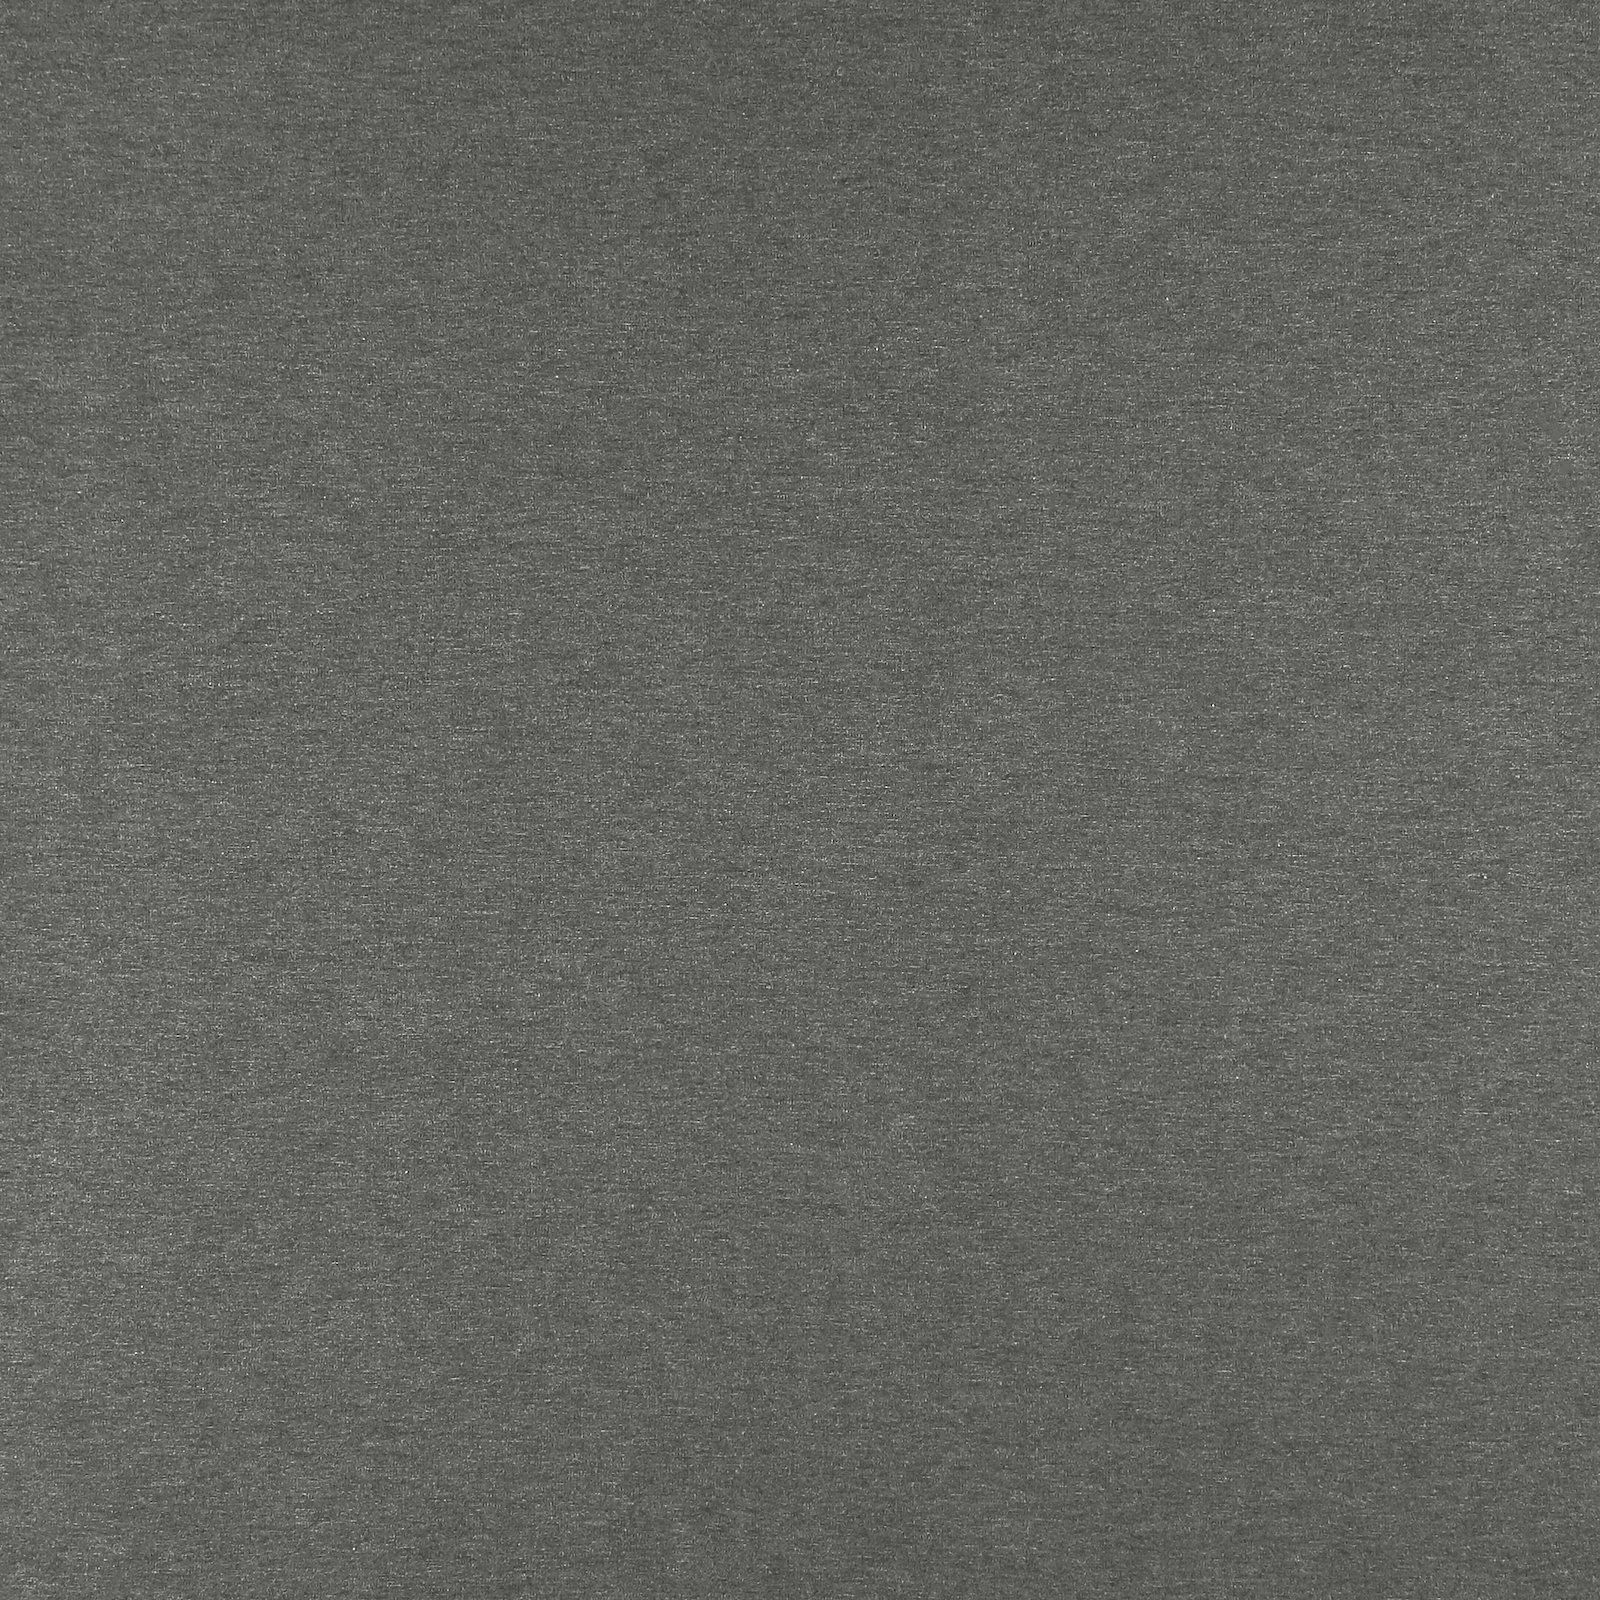 Ponte de roma dark grey melange 271040_pack_solid